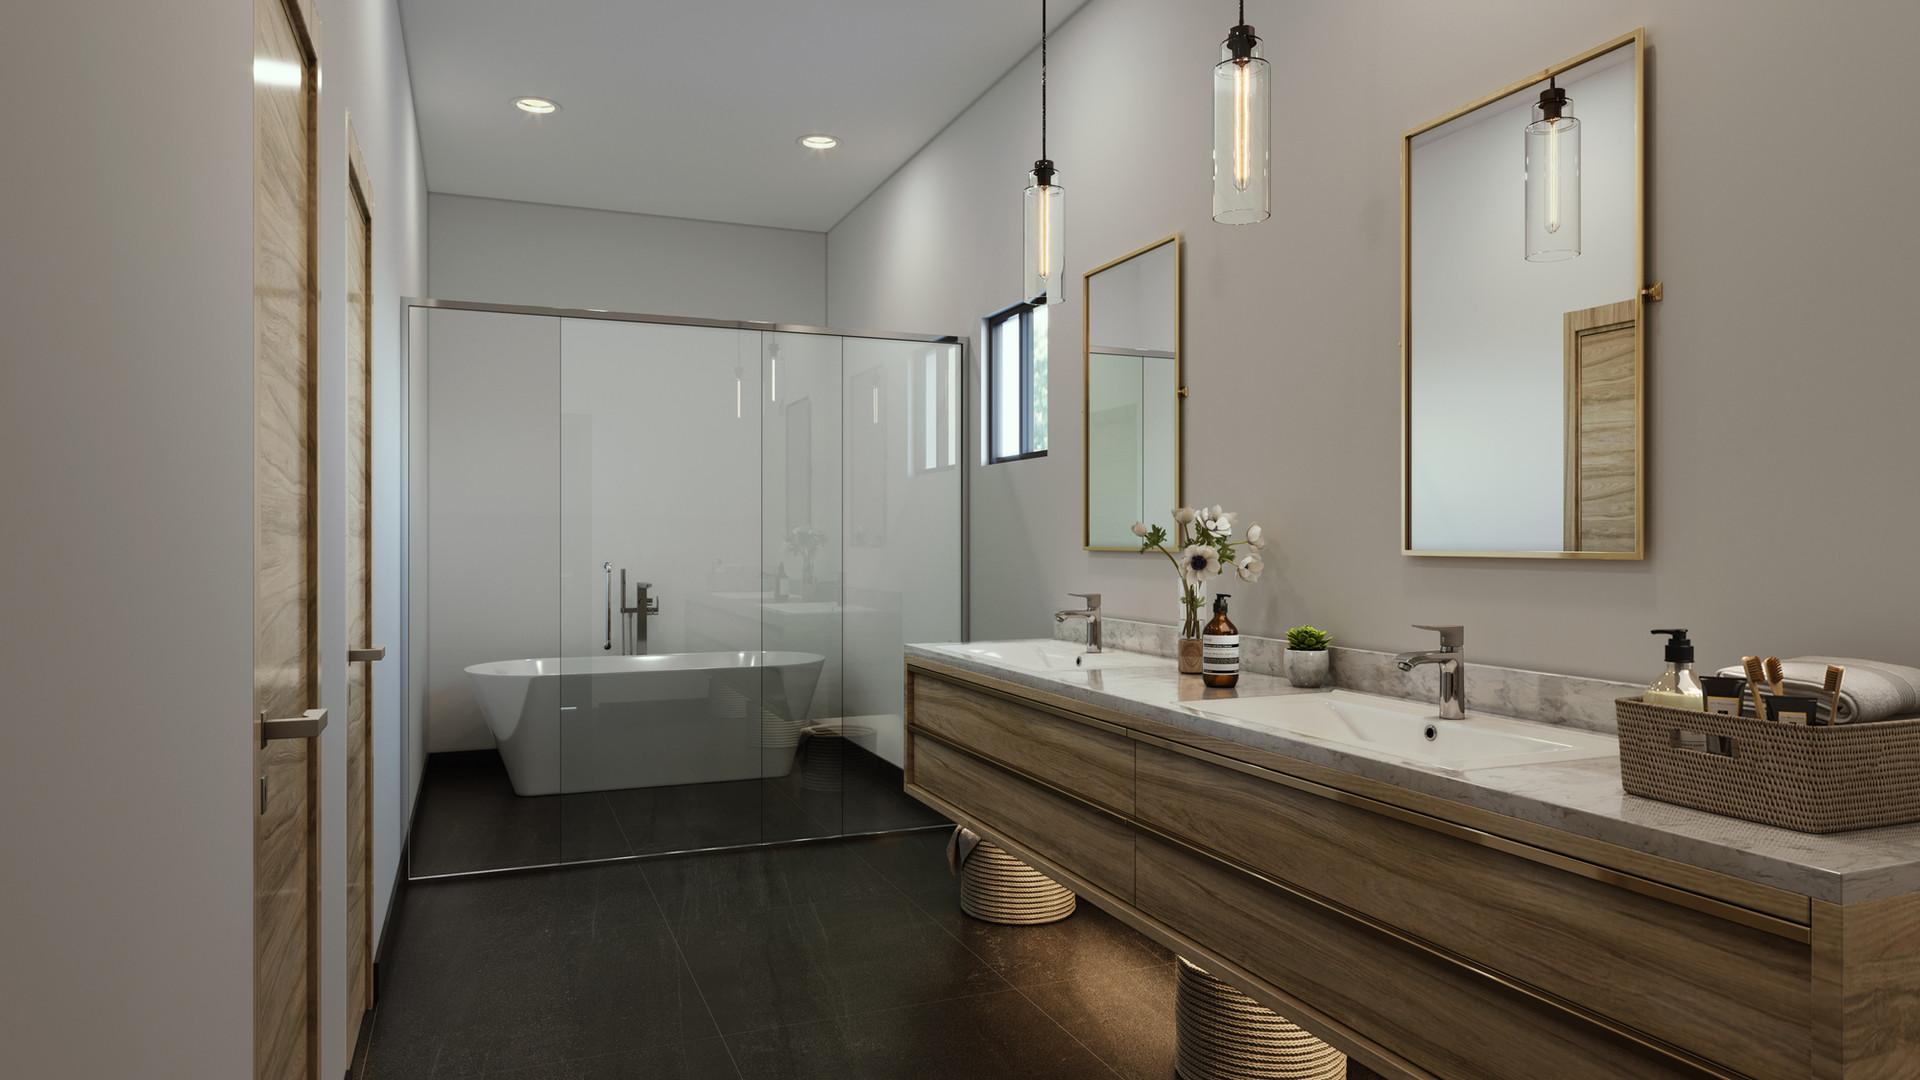 large-11---bathroom-perspectivehi-res.jp